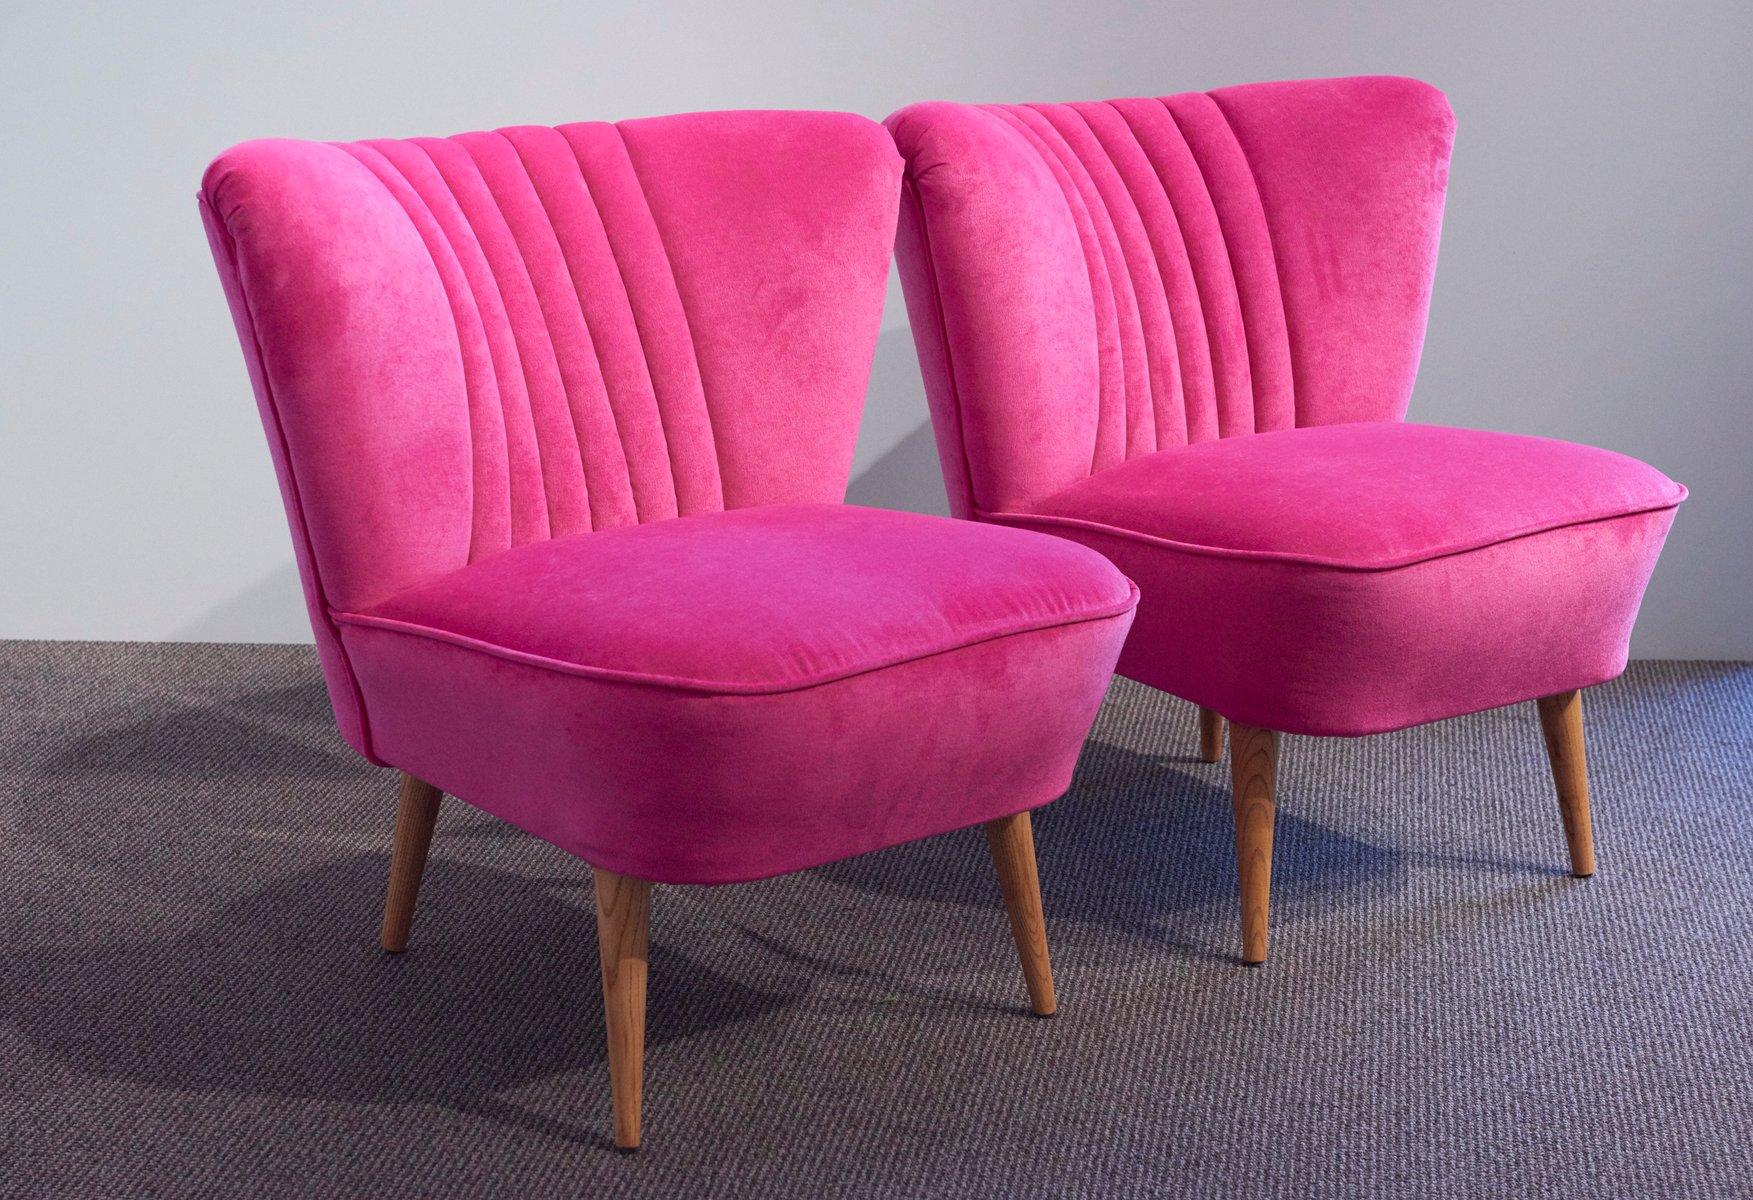 velvet armchair pink folding chair rack diy german shell back cocktail chairs 1950s set